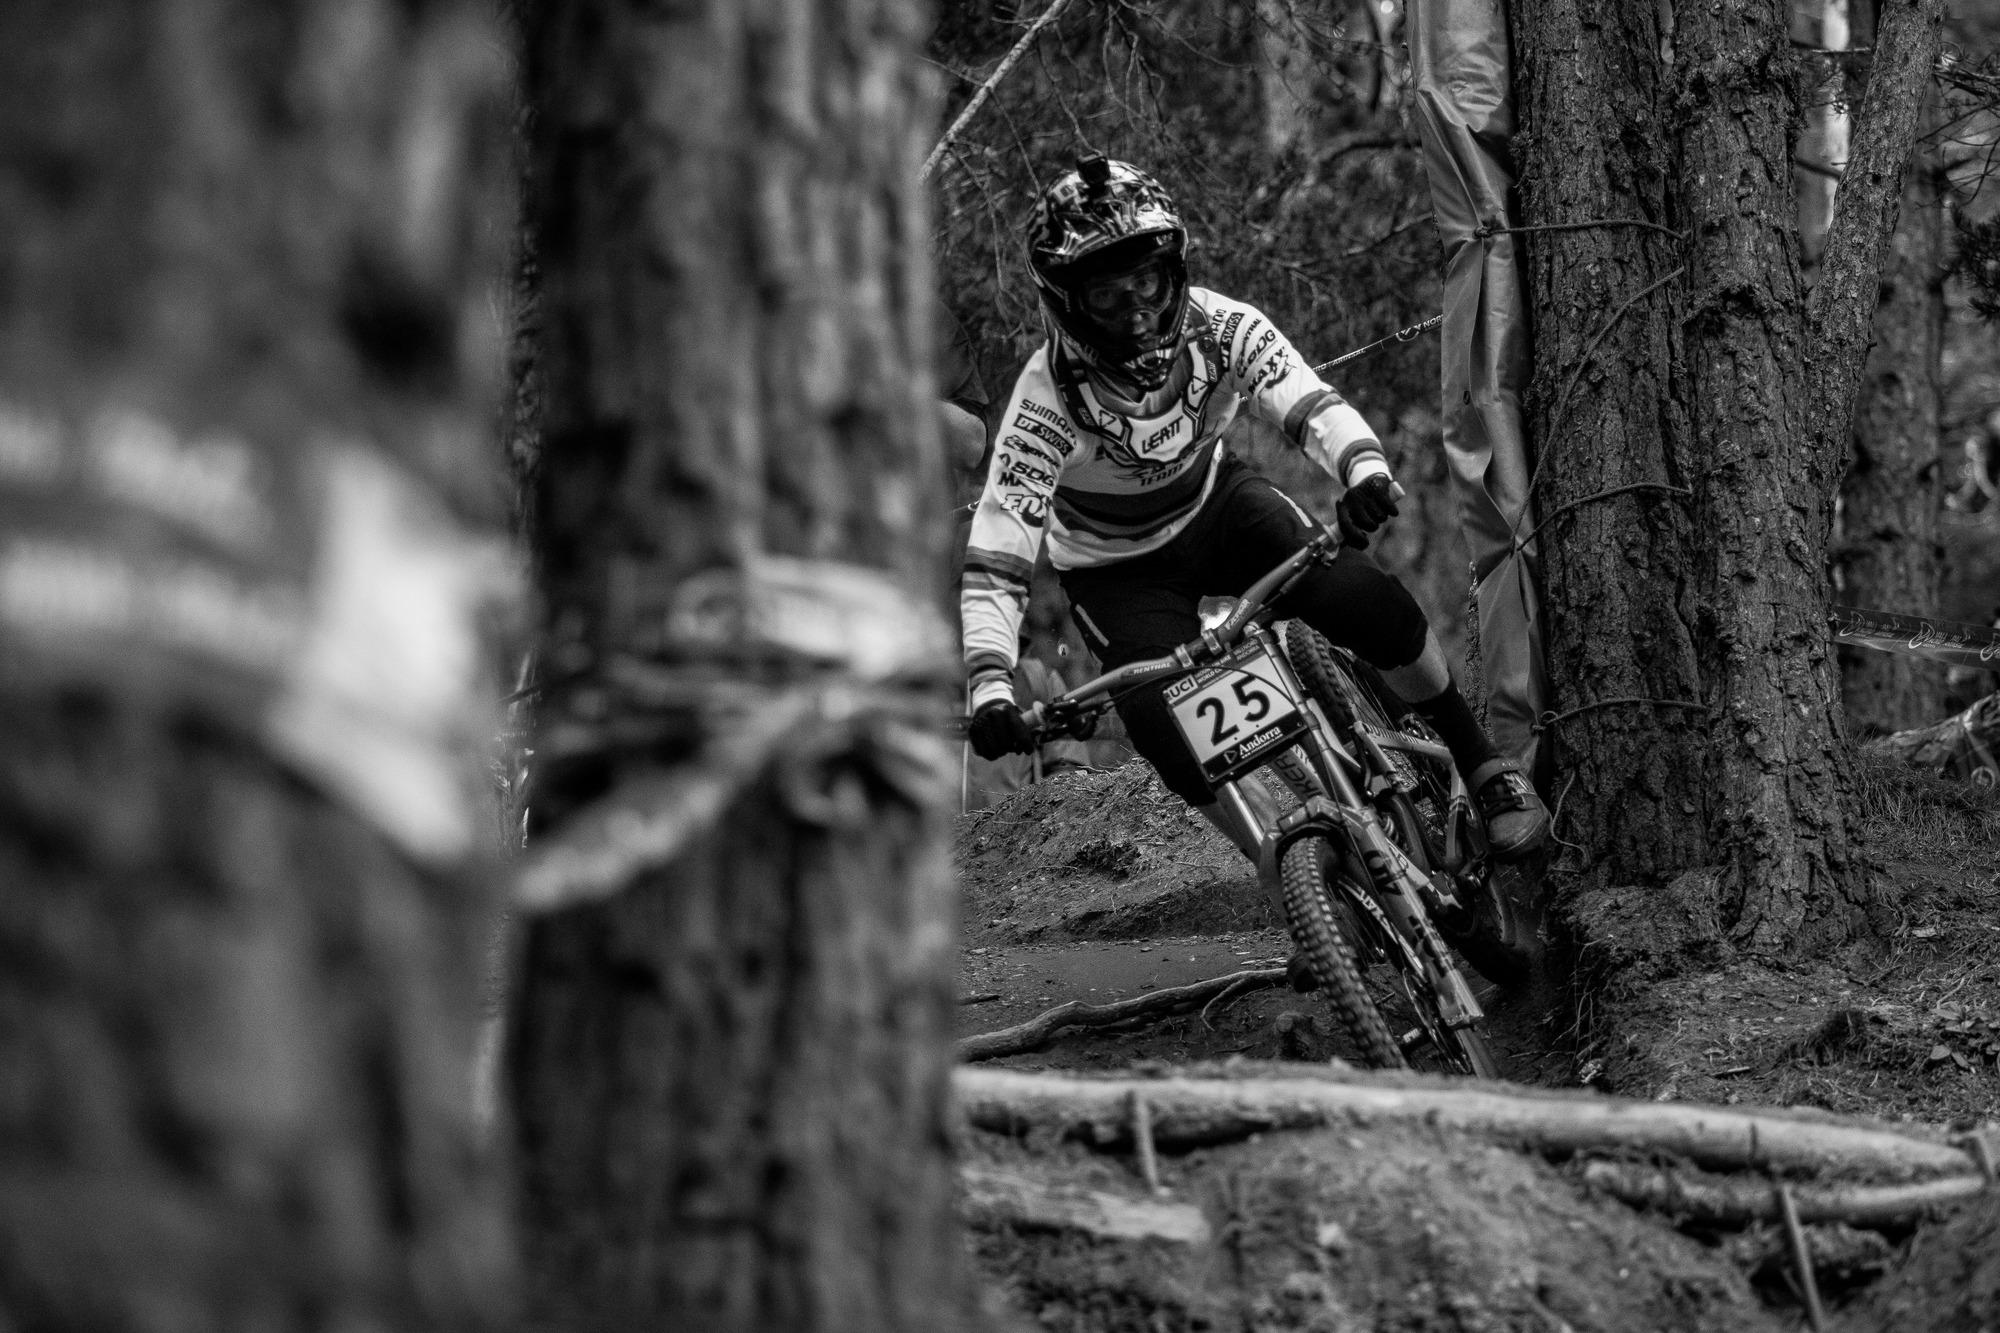 Danny Hart through the woods